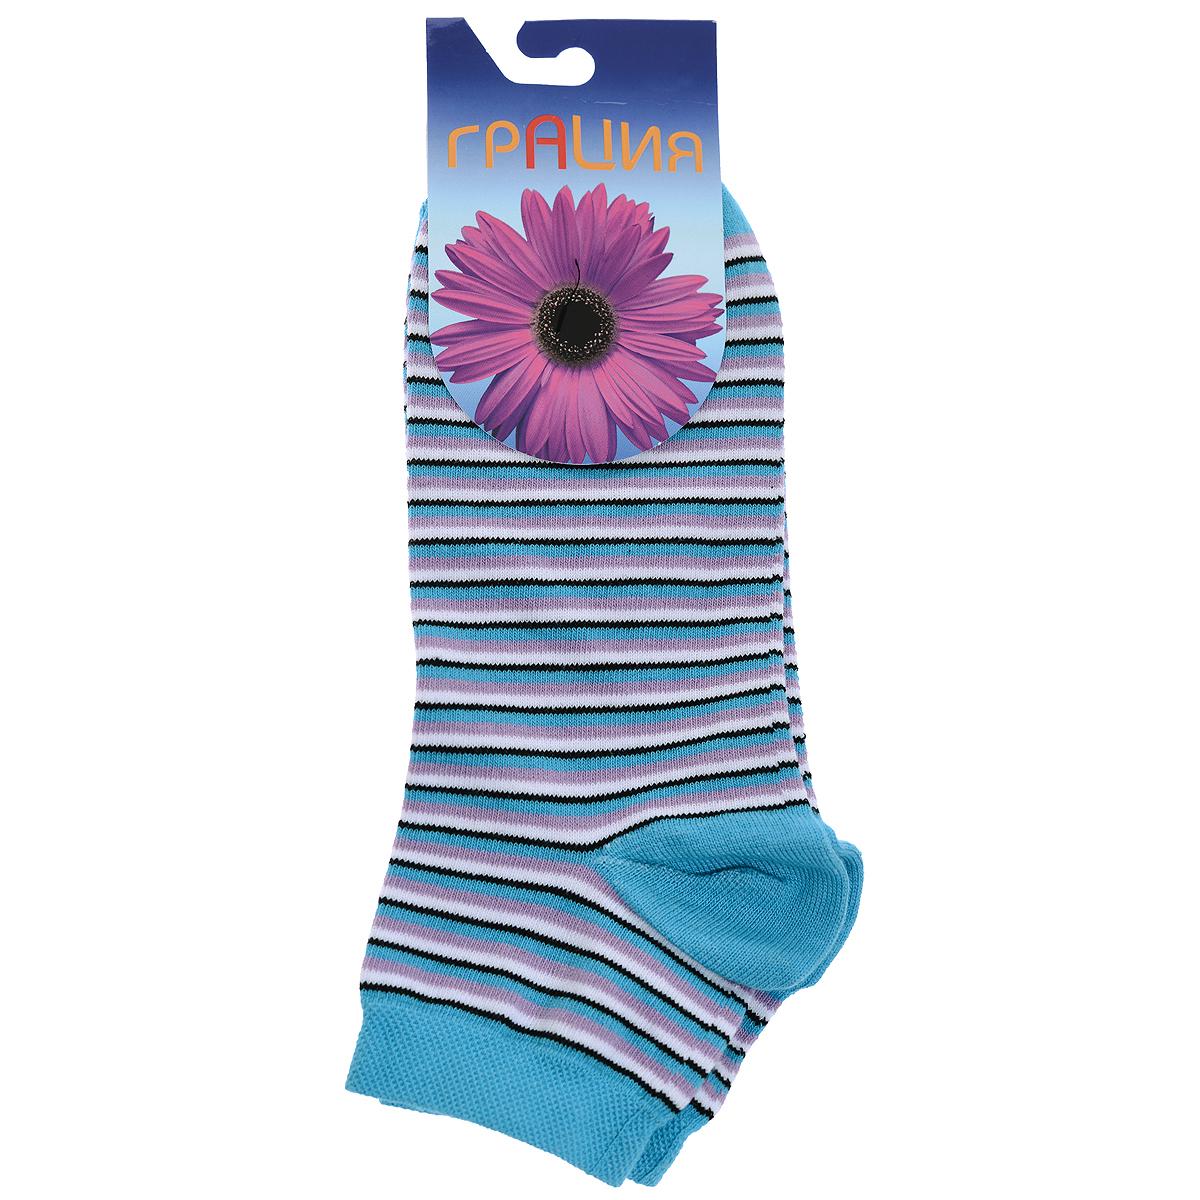 Носки женские Грация, цвет: голубой. М1088. Размер 38/40 носки женские грация цвет светло серый h 003 размер 38 40